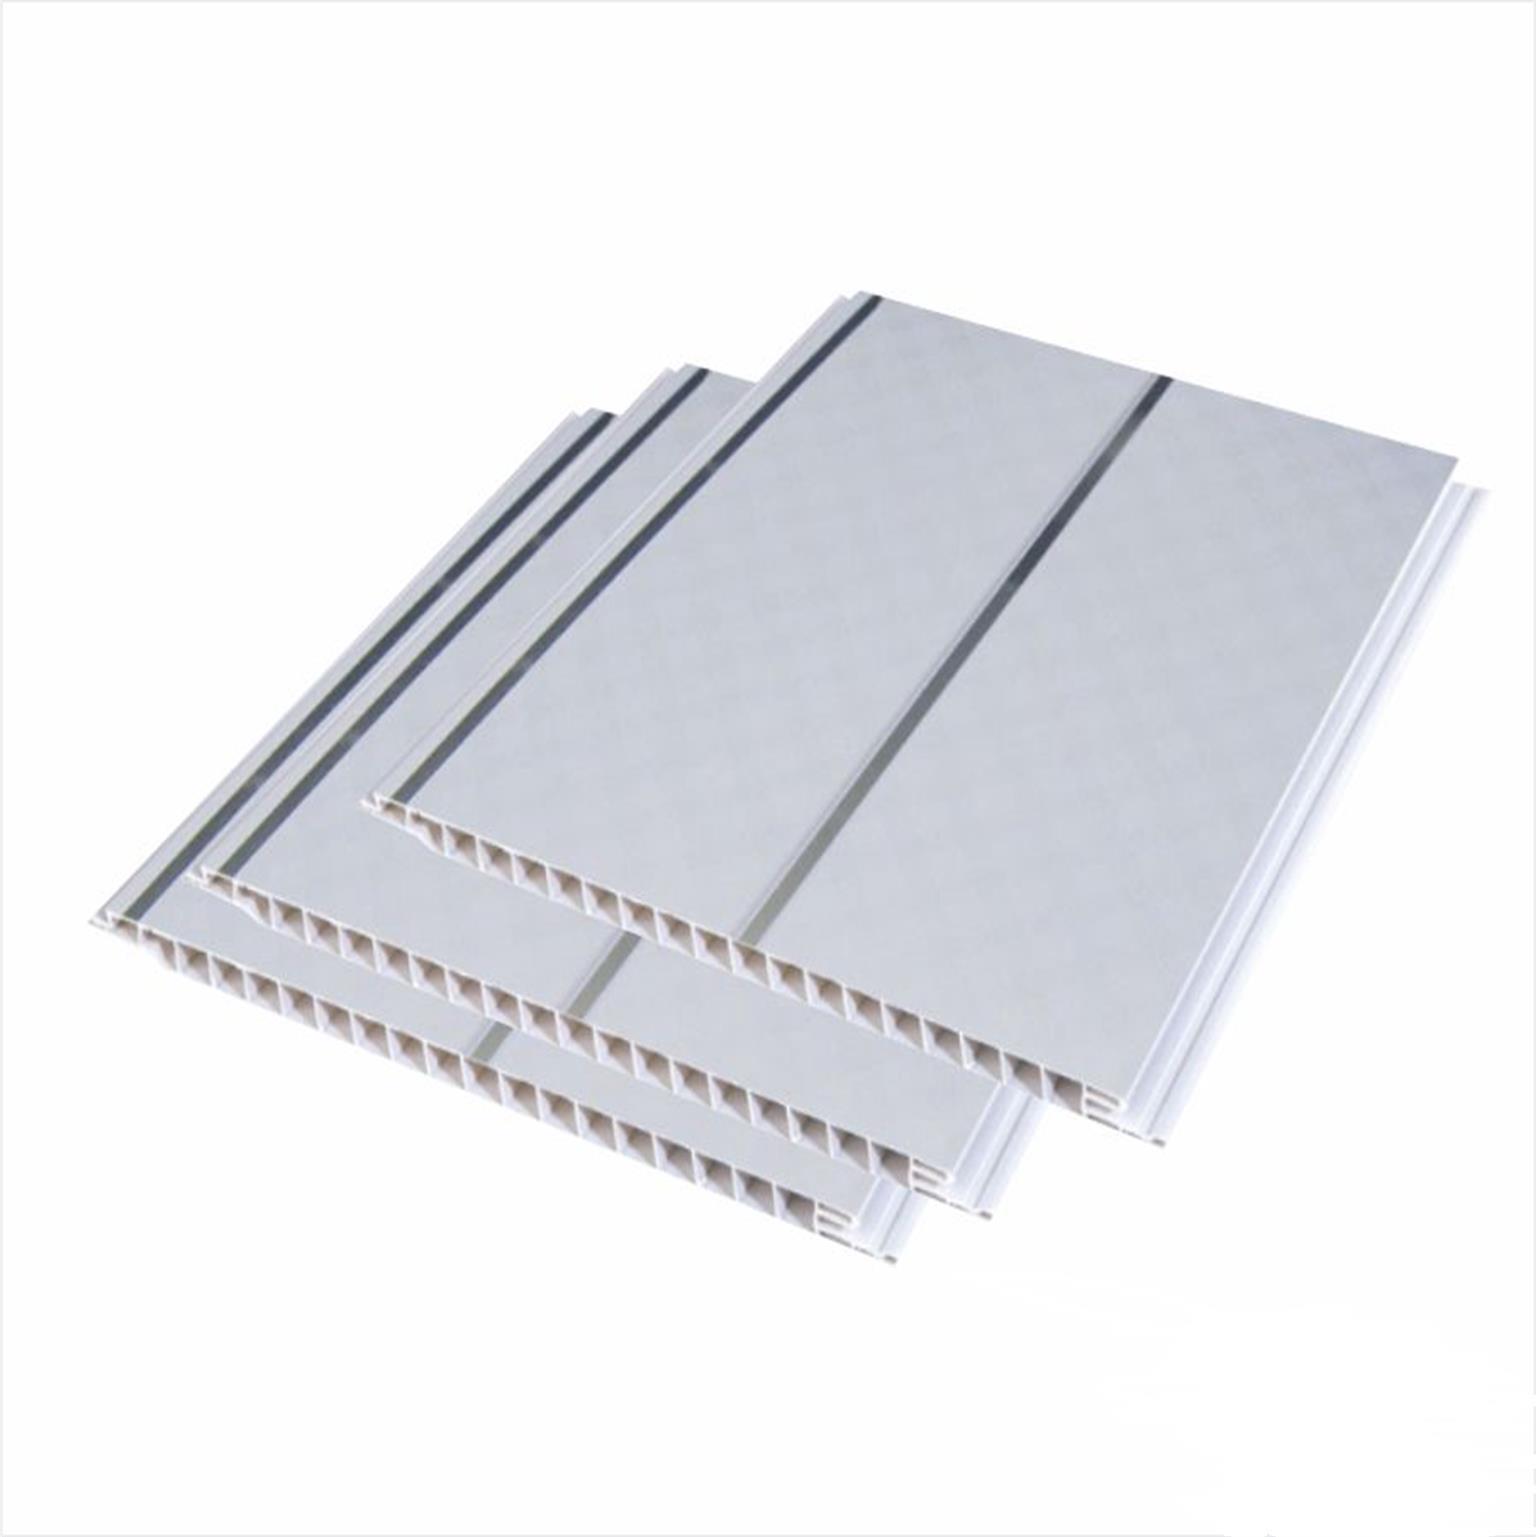 CEILING: PVC Ceiling Panels